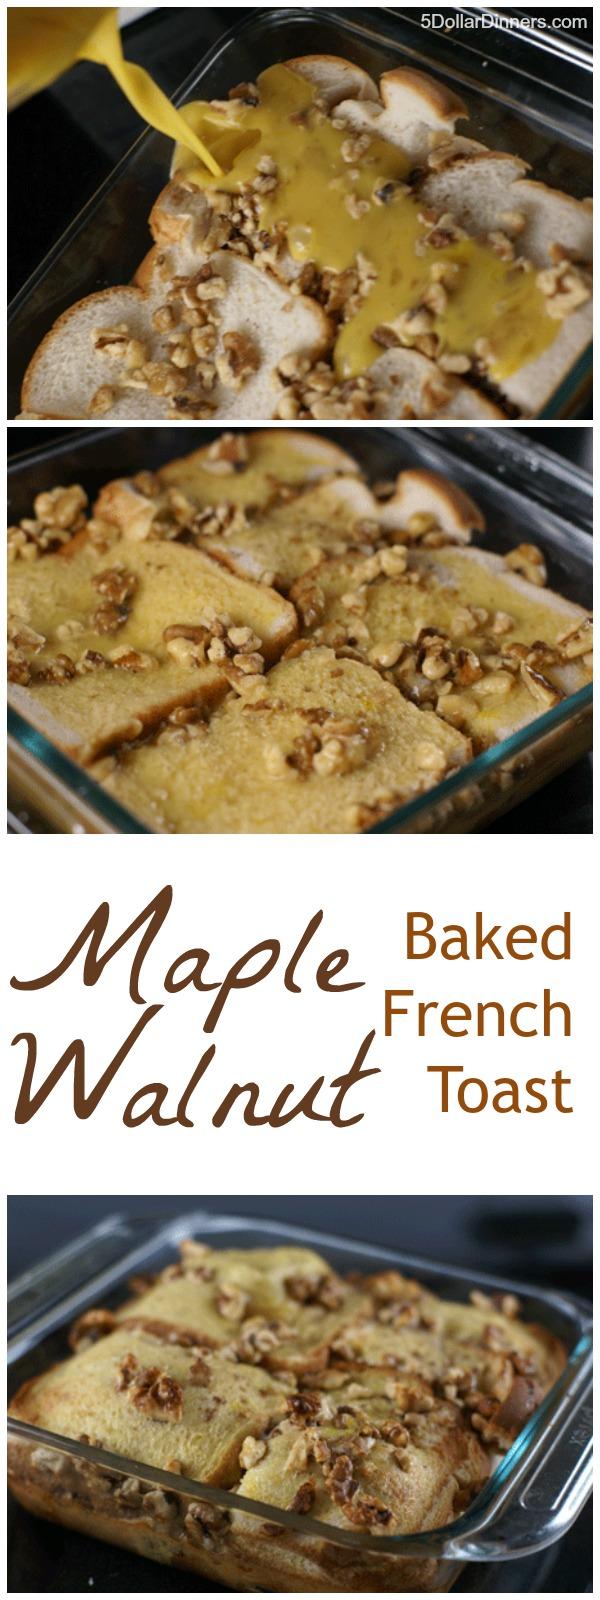 Maple Walnut Baked French Toast | 5DollarDinners.com